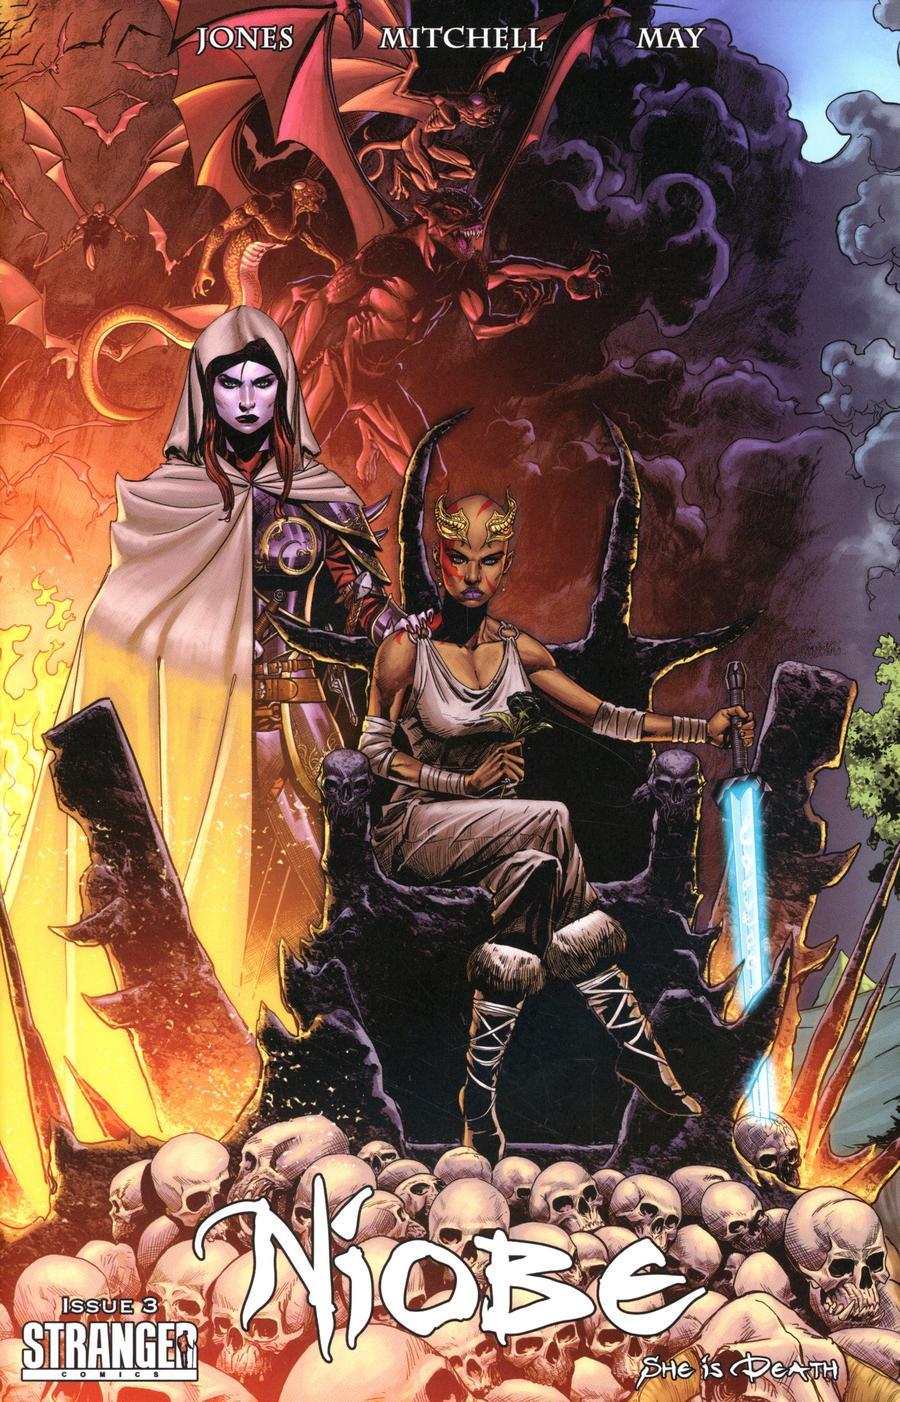 Niobe: She Is Death #3 (2020)